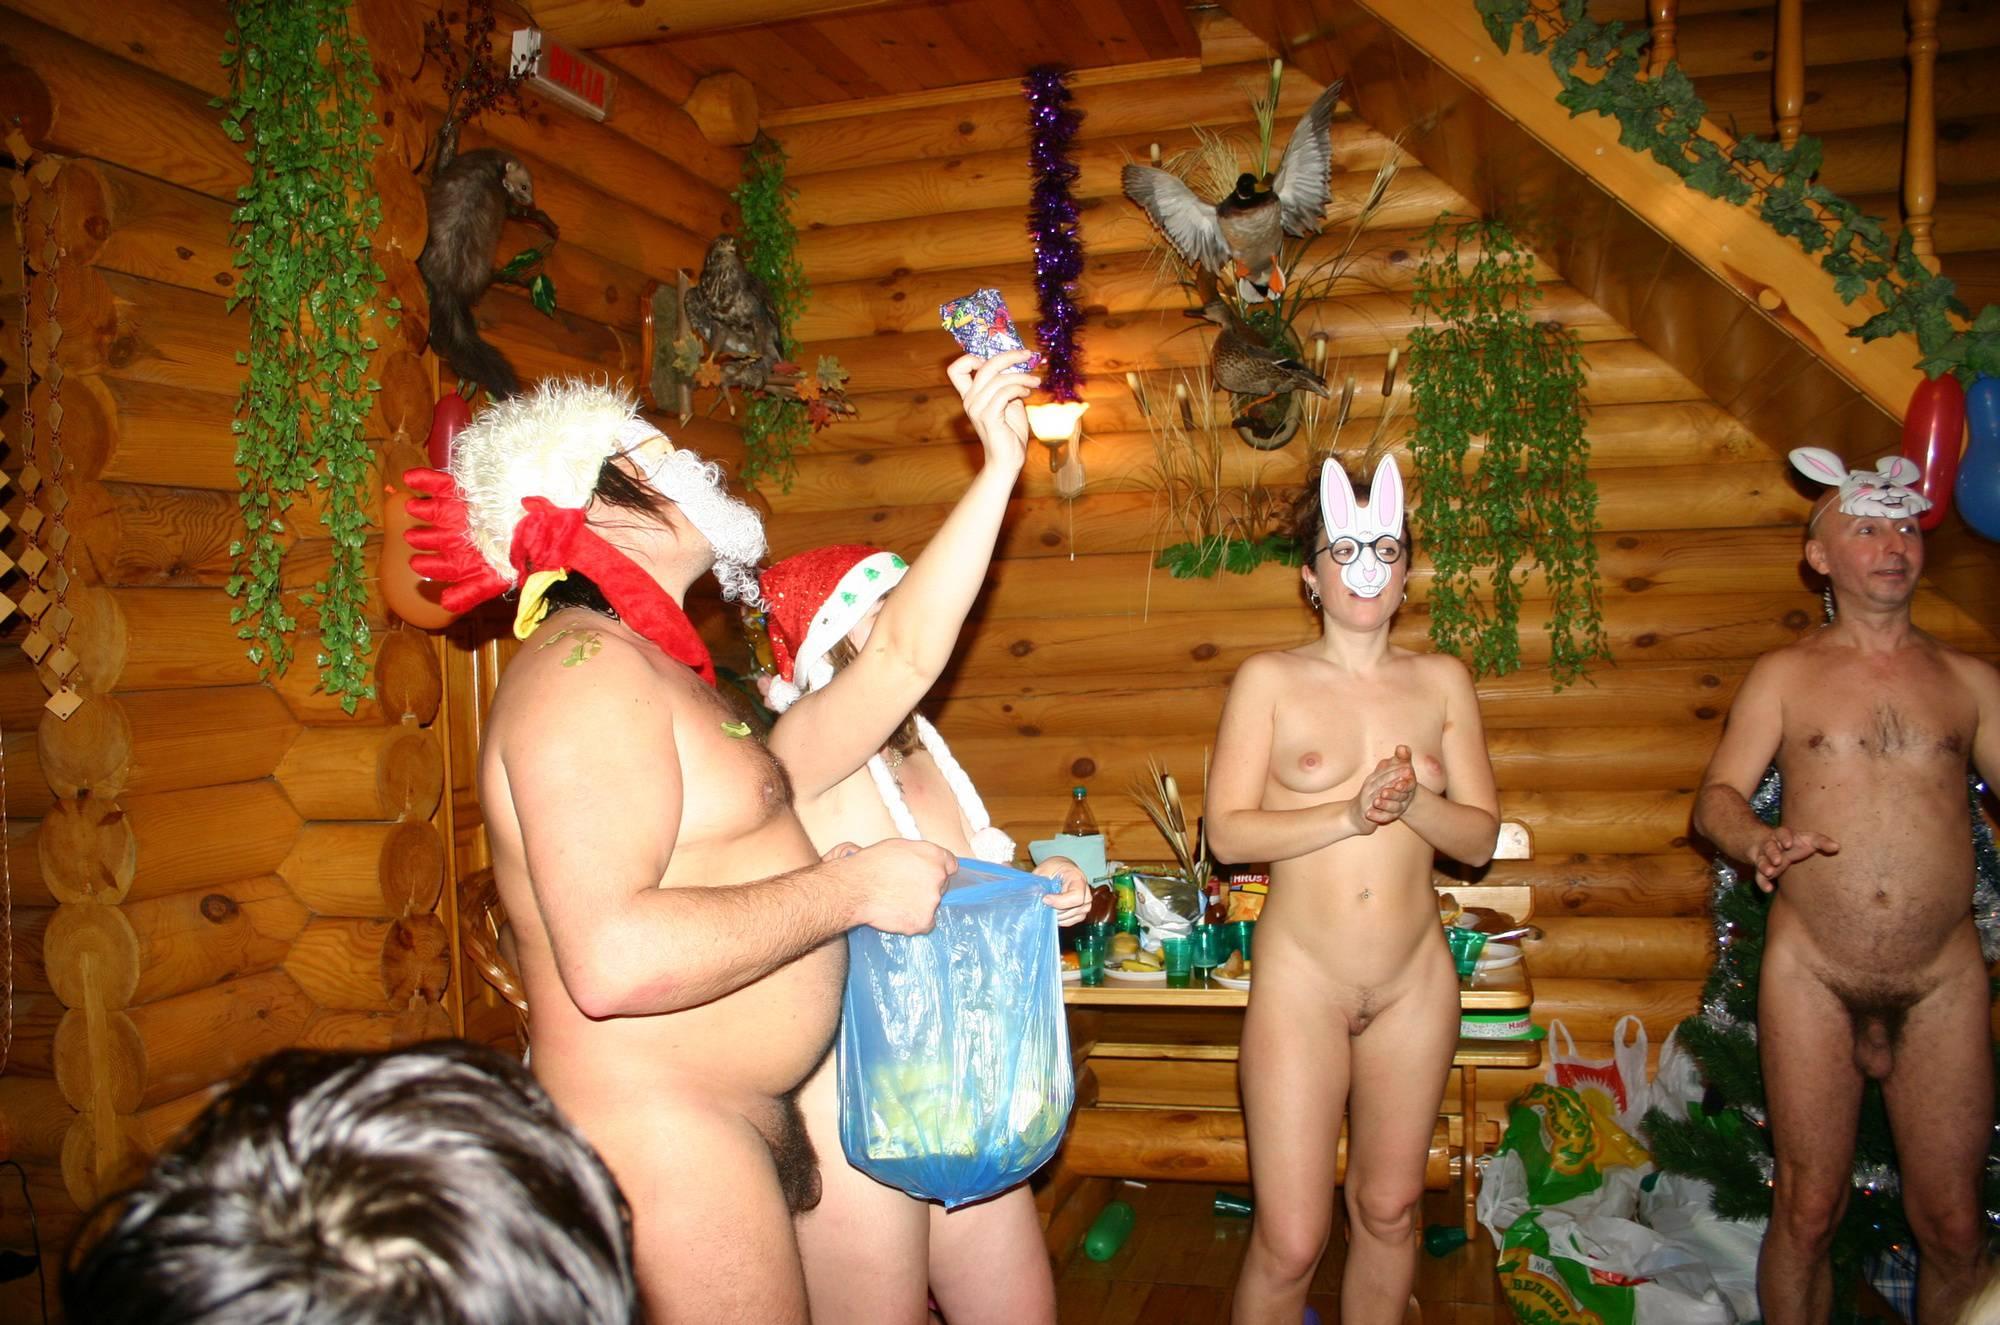 Nudist Pictures Kiev Masquerade Huddle - 1